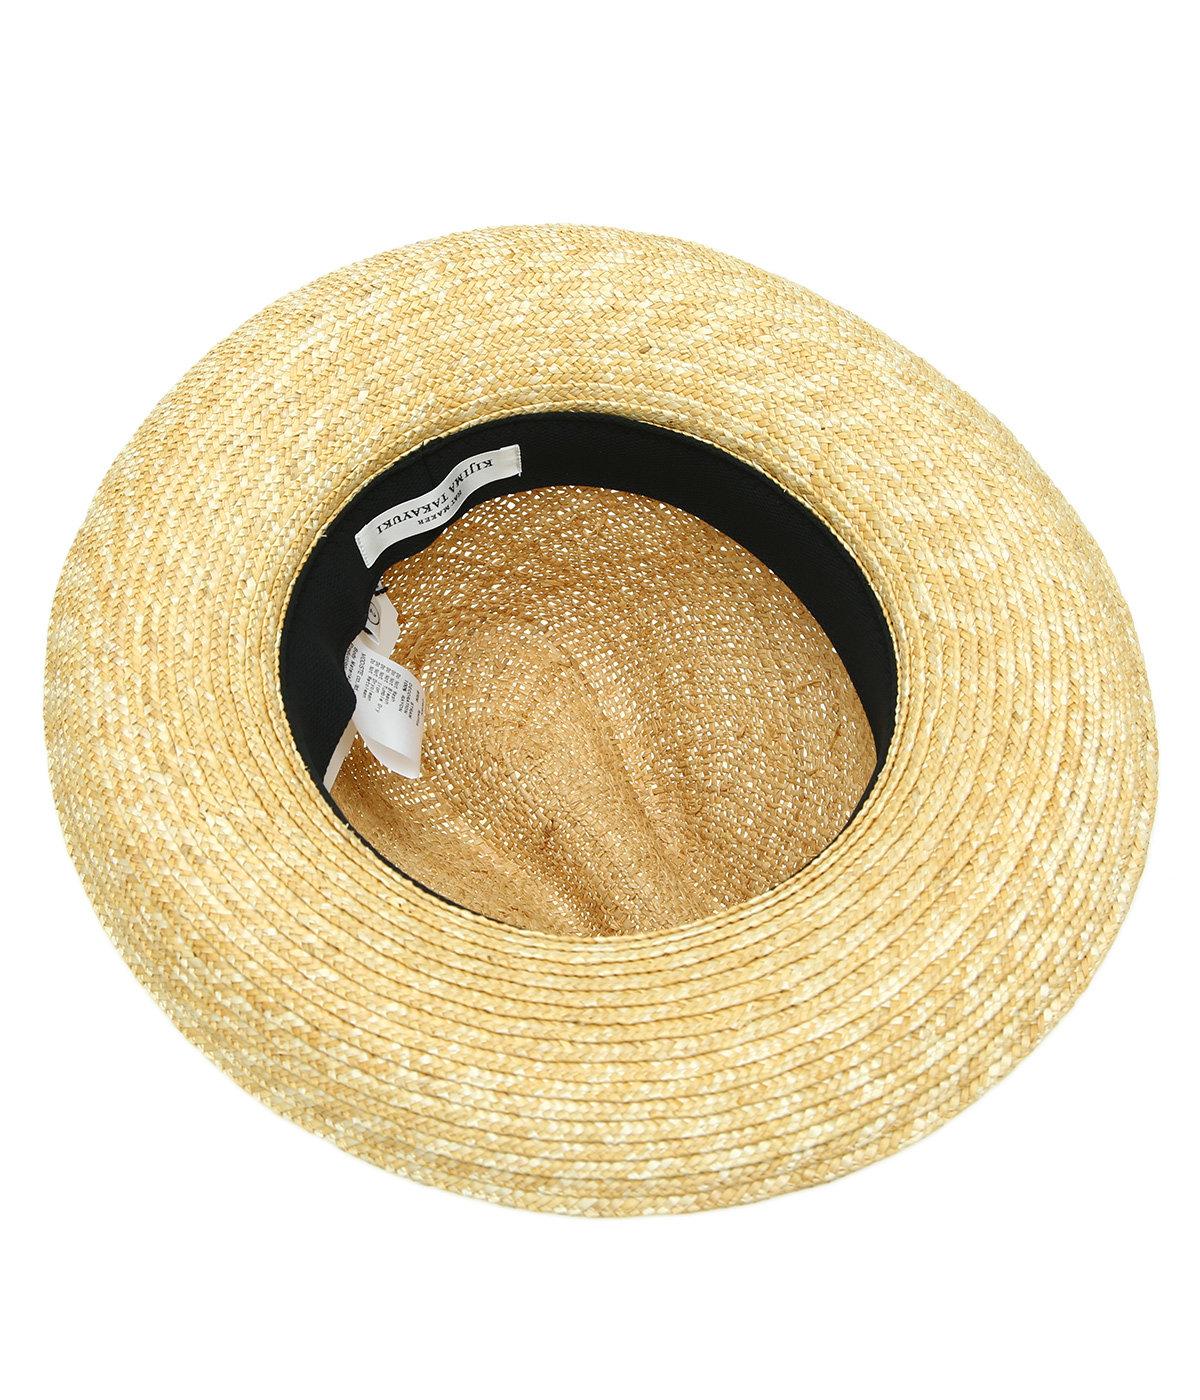 Raffia Combi Hat